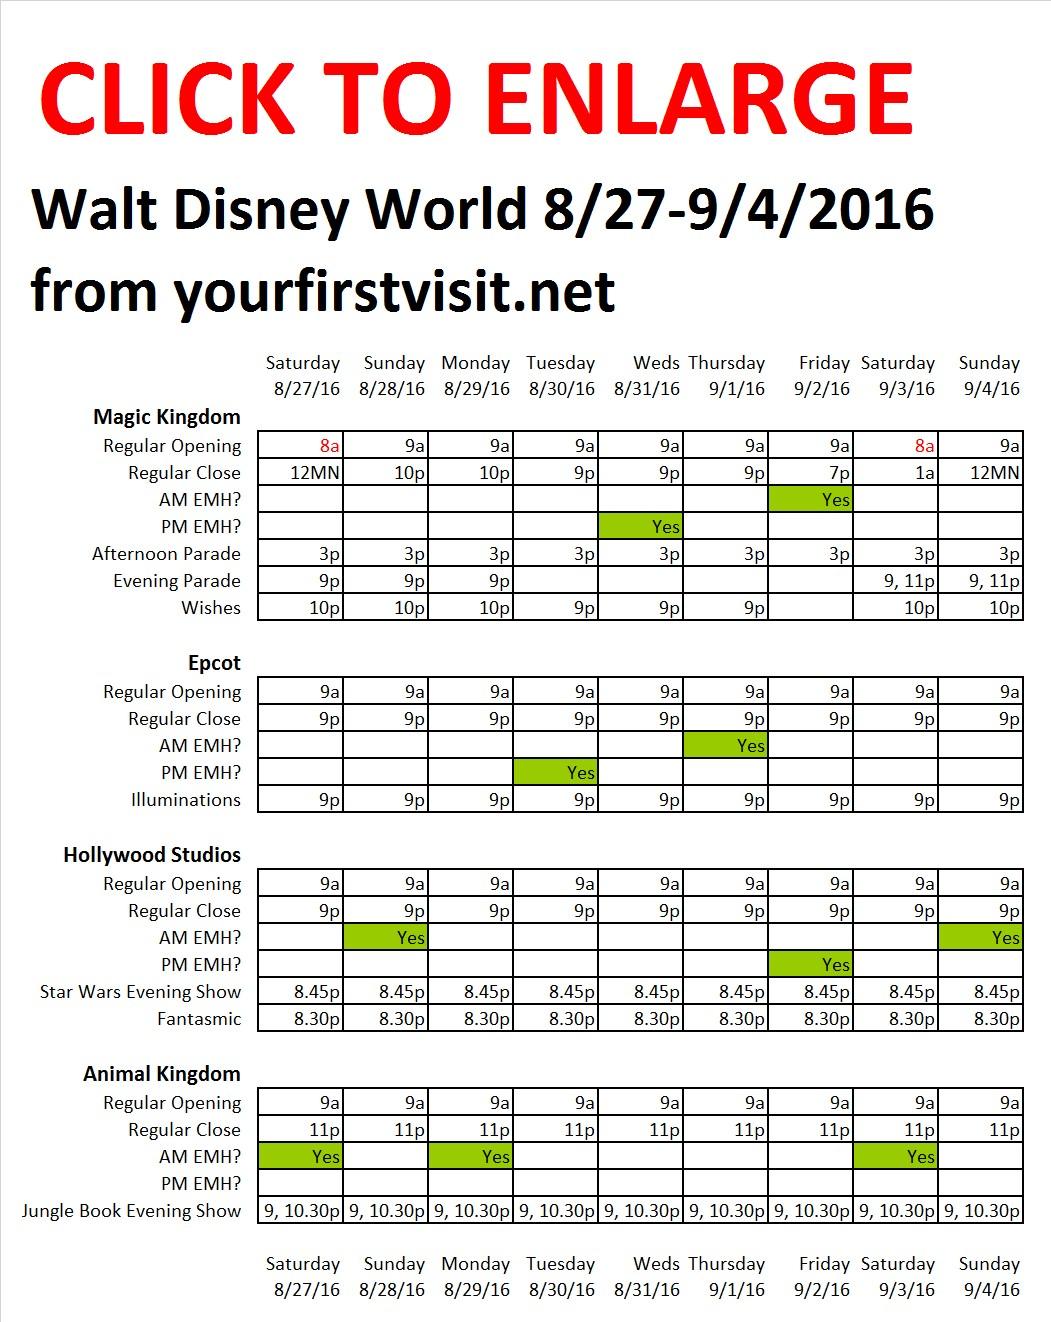 Disney World 8-27 to 9-4-2016 from yourfirstvisit.net